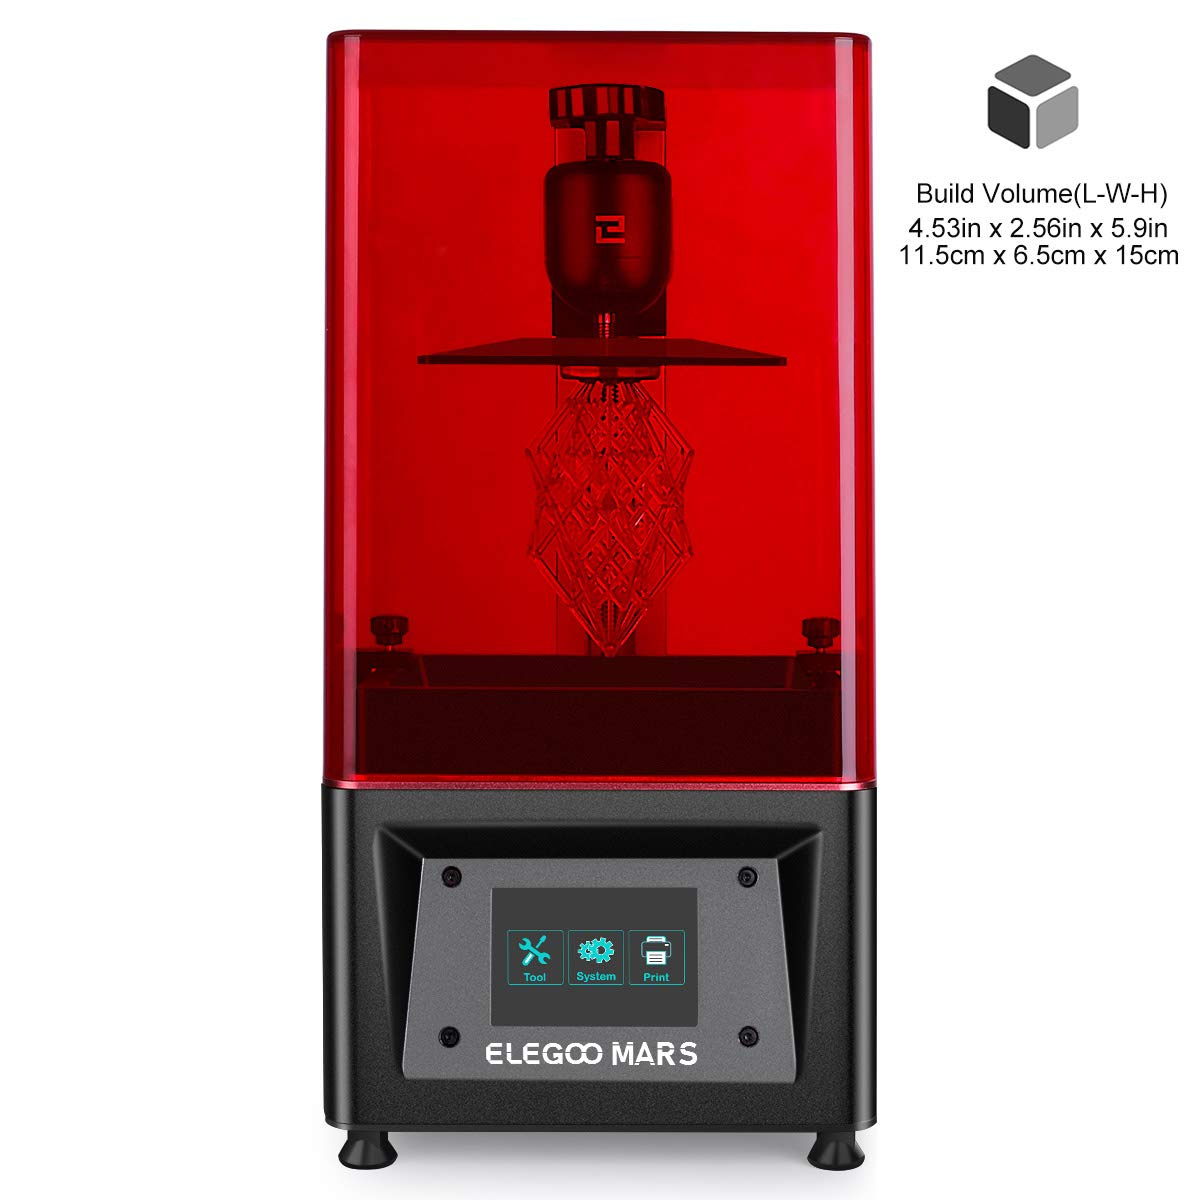 ELEGOO Photocuring Printer Off line Printing